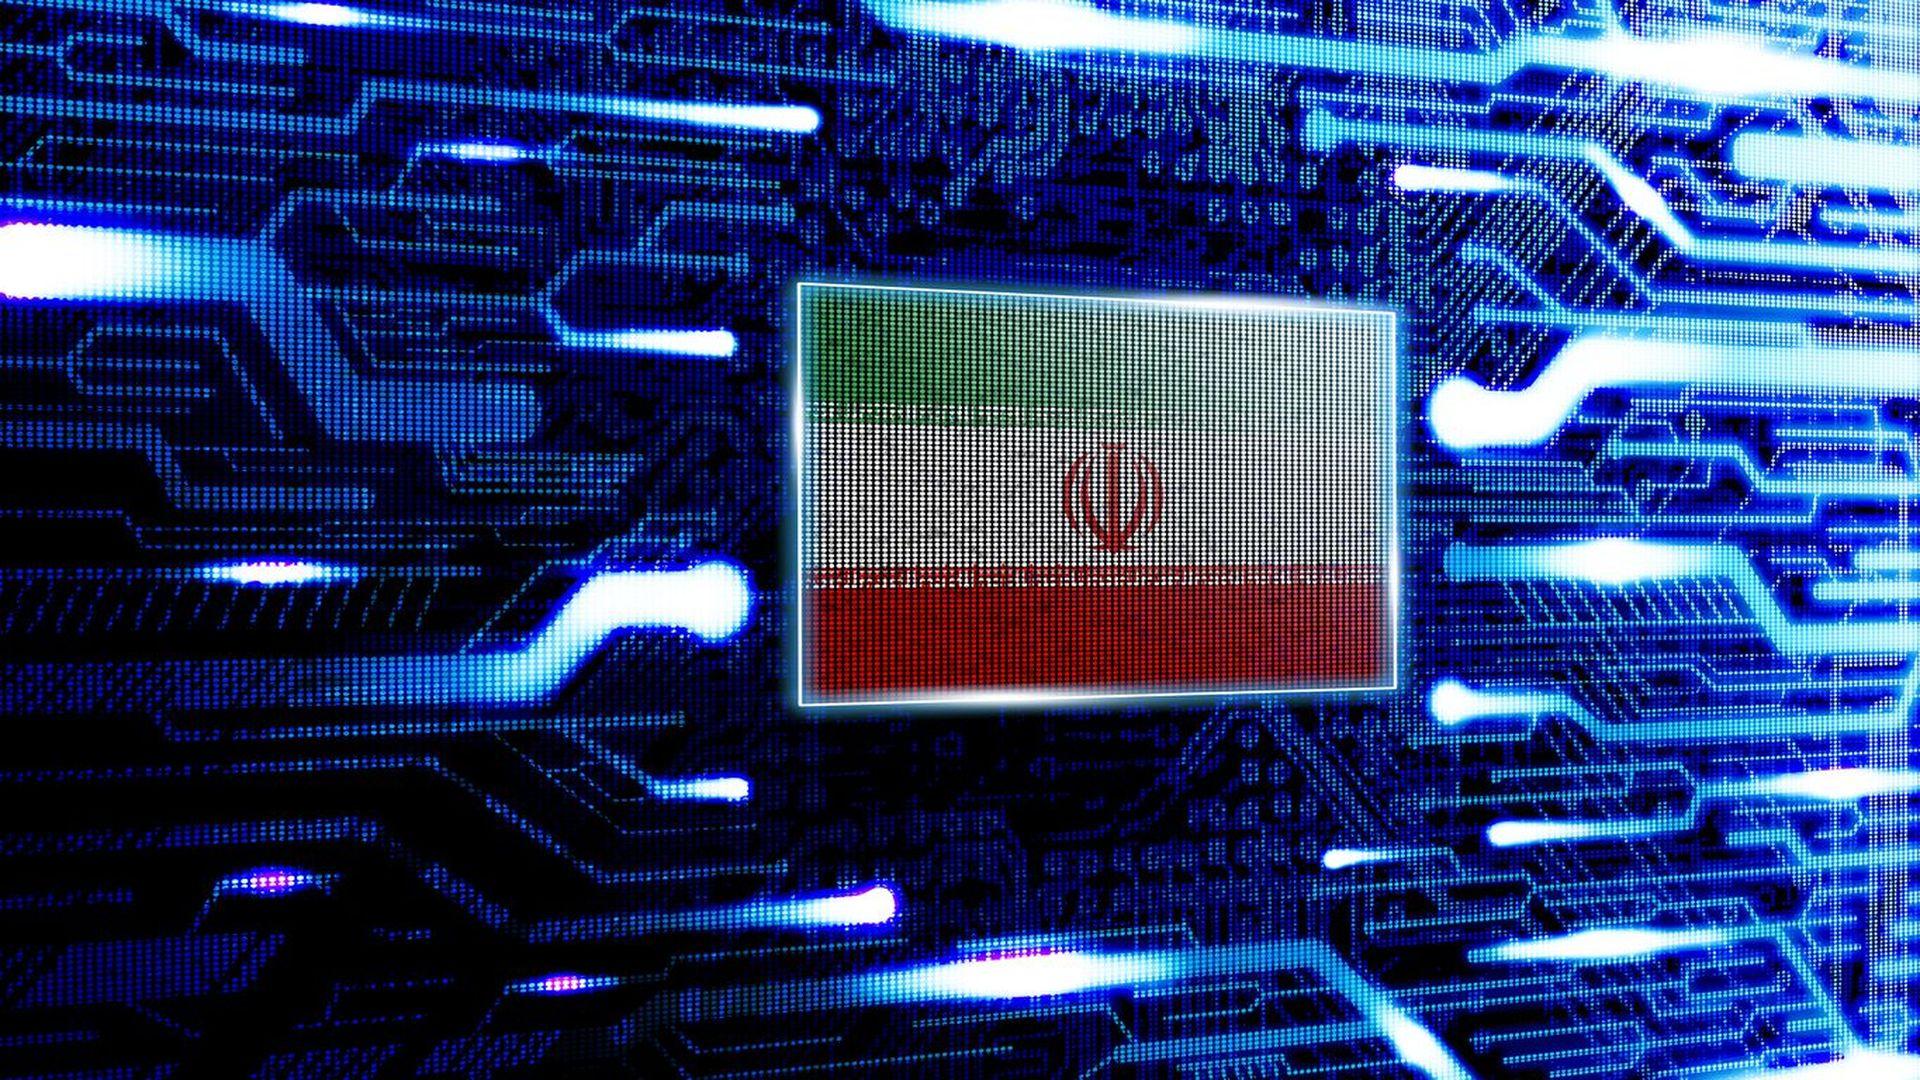 The Iranian flag appears in a futuristic illustration.